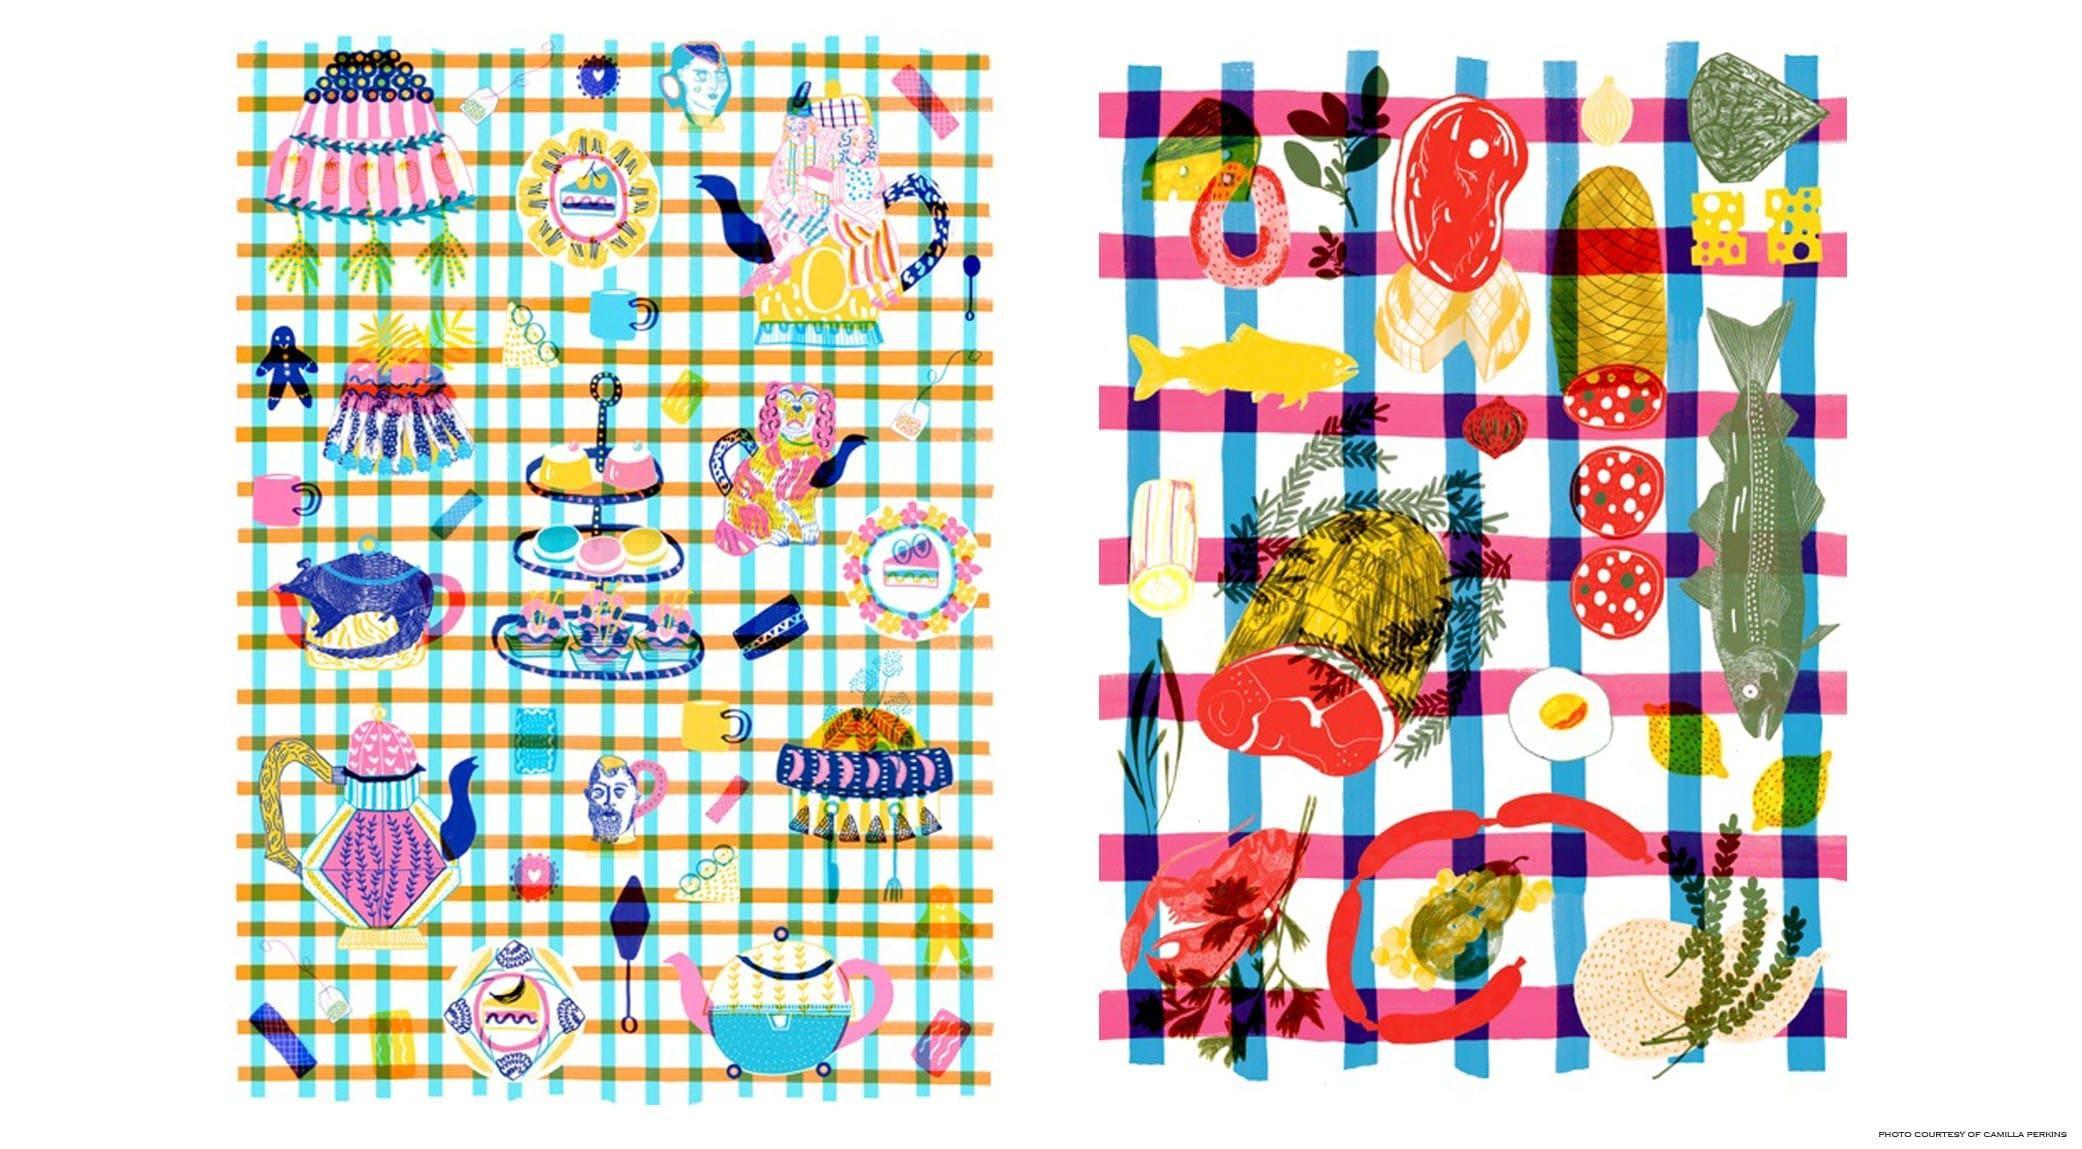 original_Tea-Party-Wrapping-Paper-changes-nostalgia.jpeg